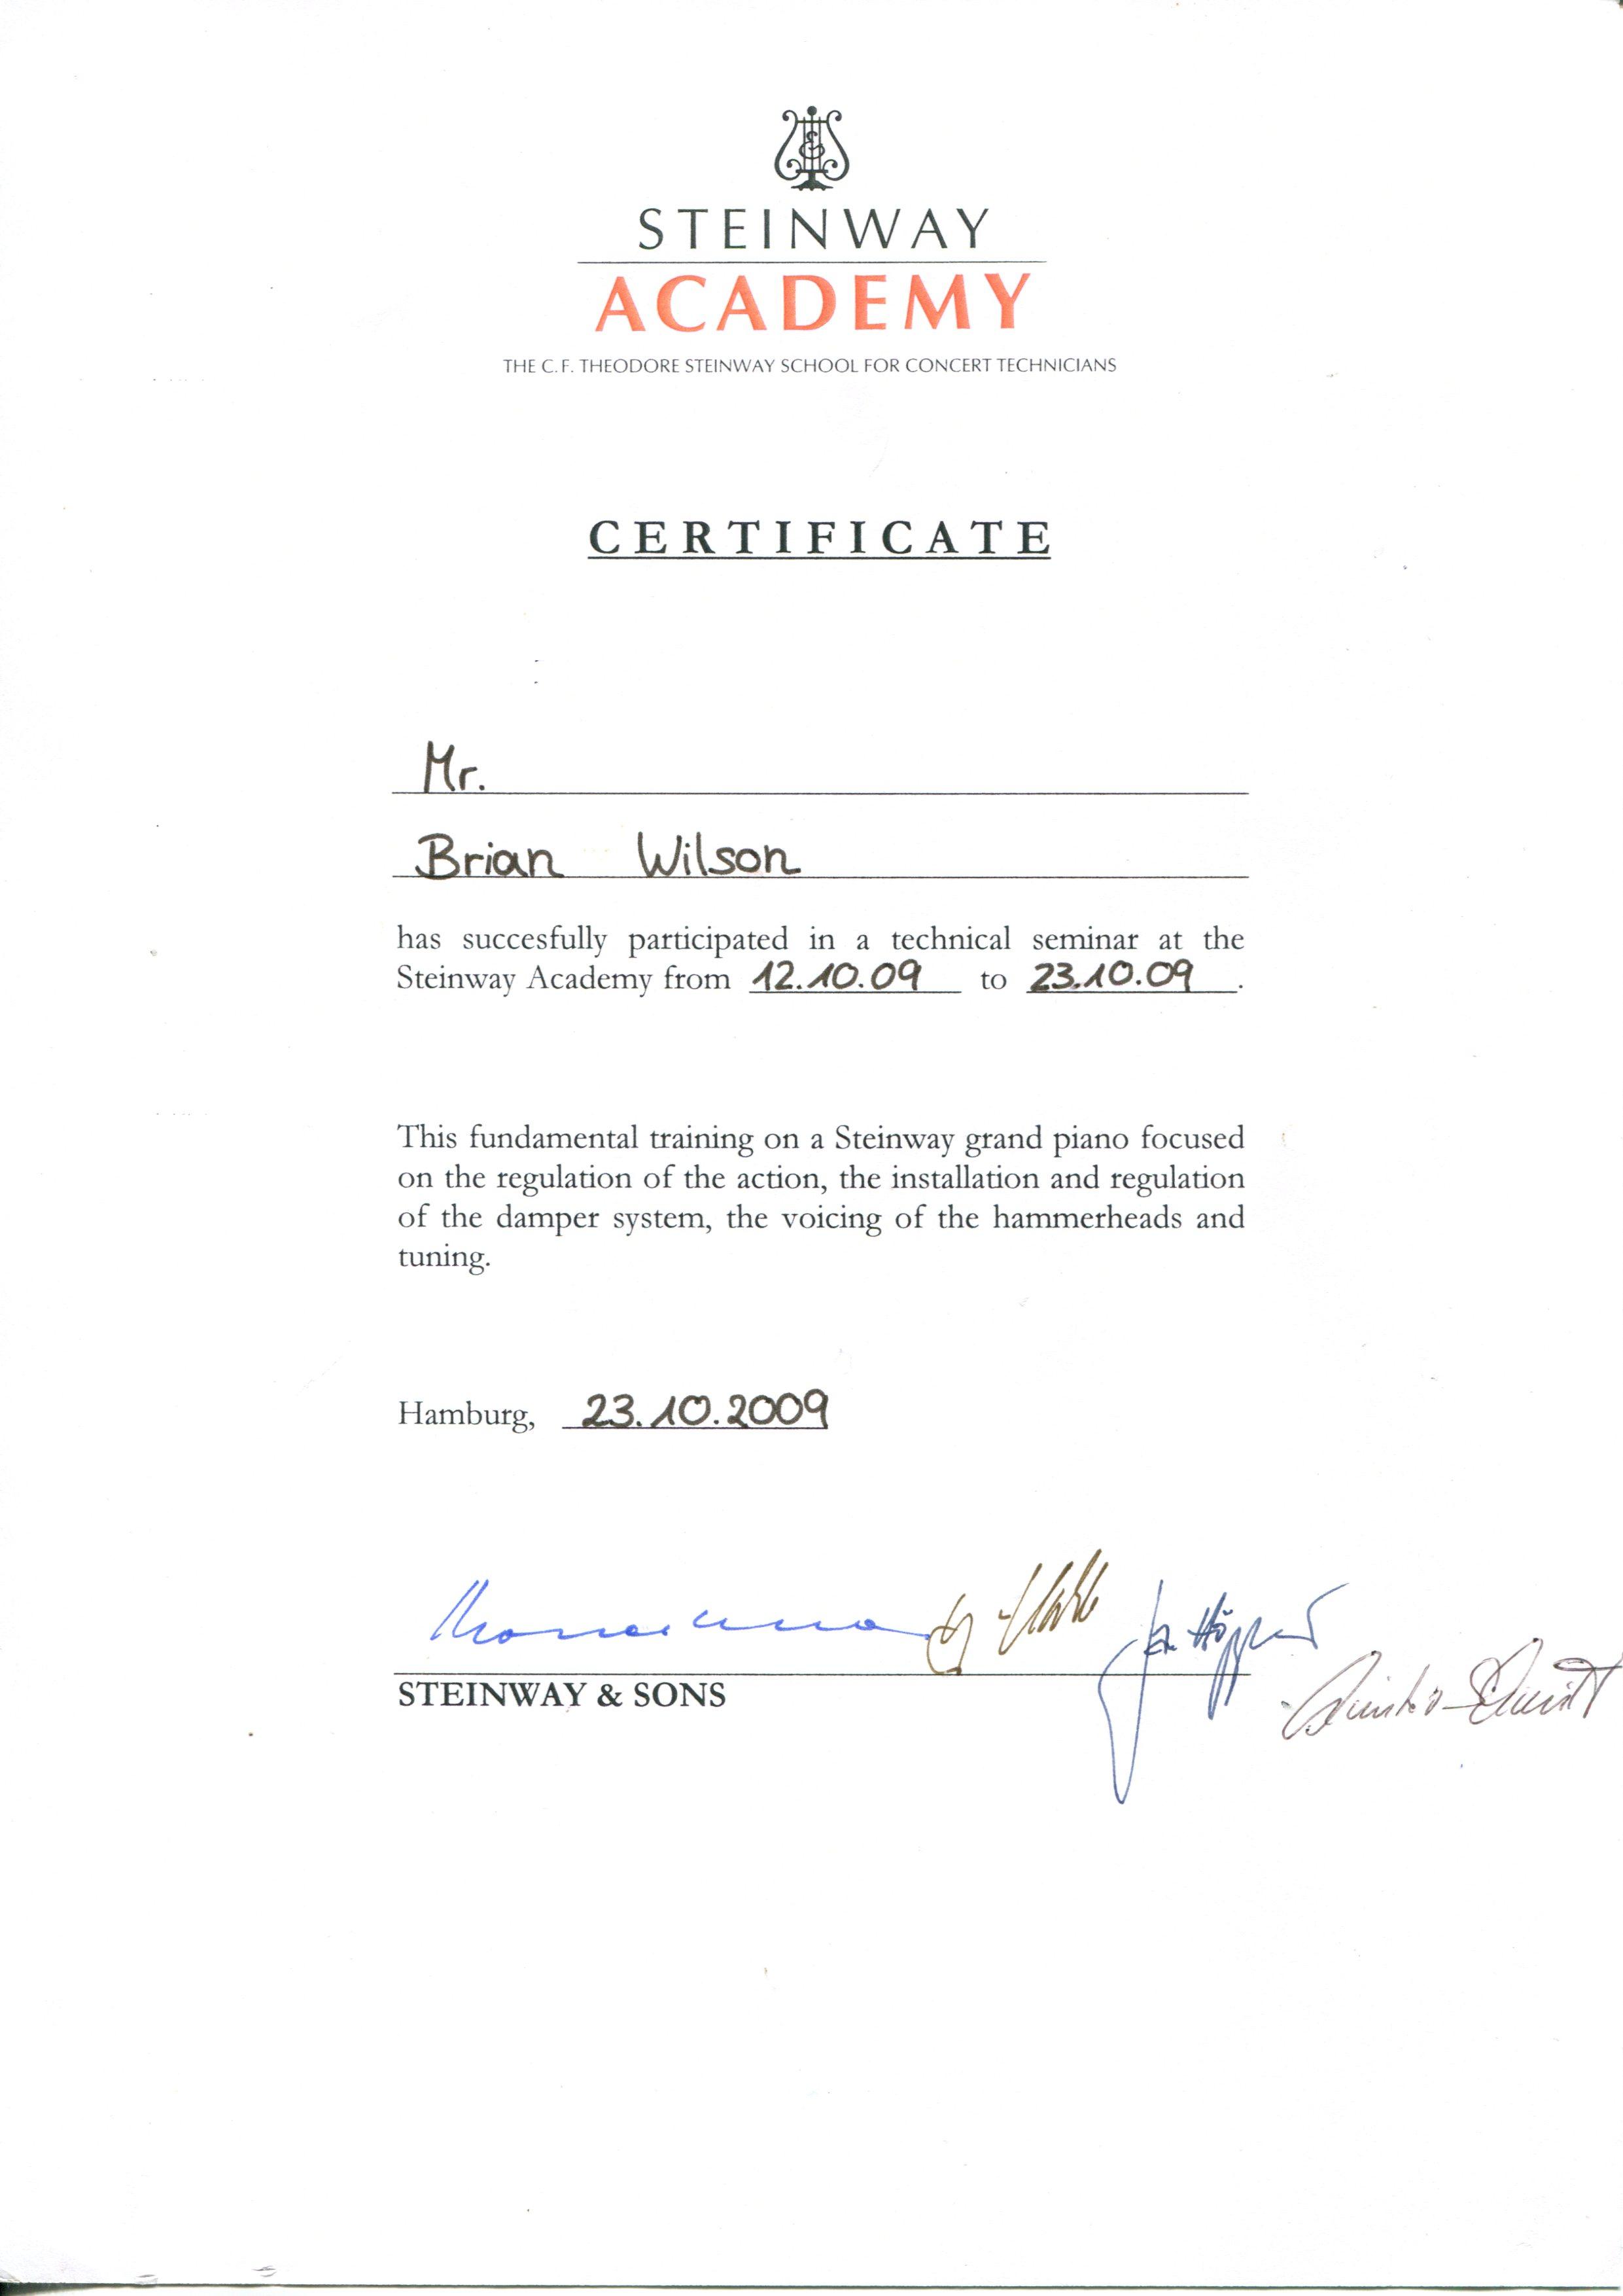 Brian Wilson - Steinway Accreditation 2009